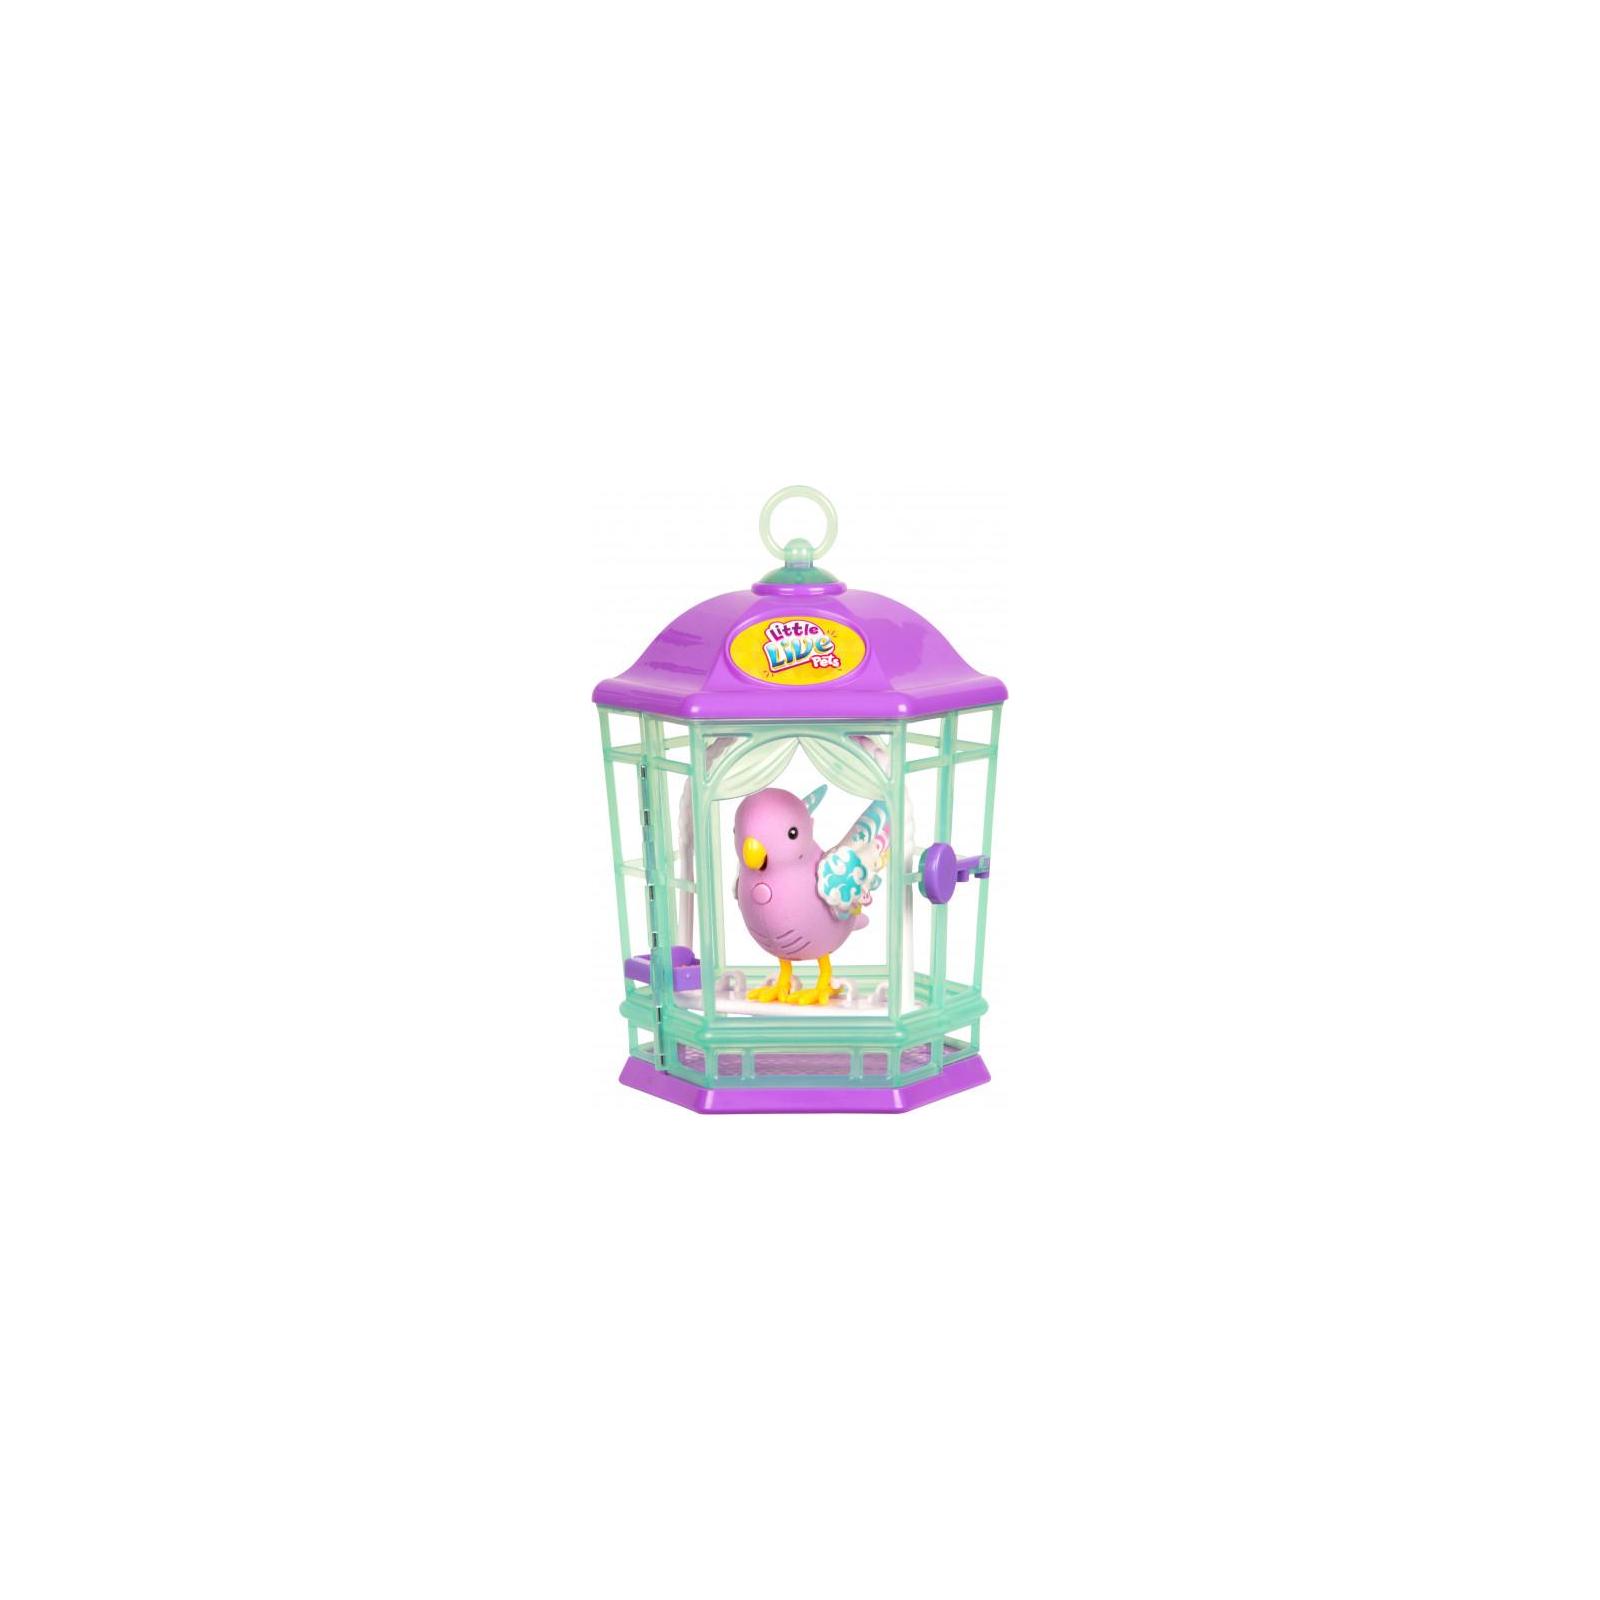 Интерактивная игрушка Moose Птичка в клетке Little Live Pets Rainbow Glow (28547)